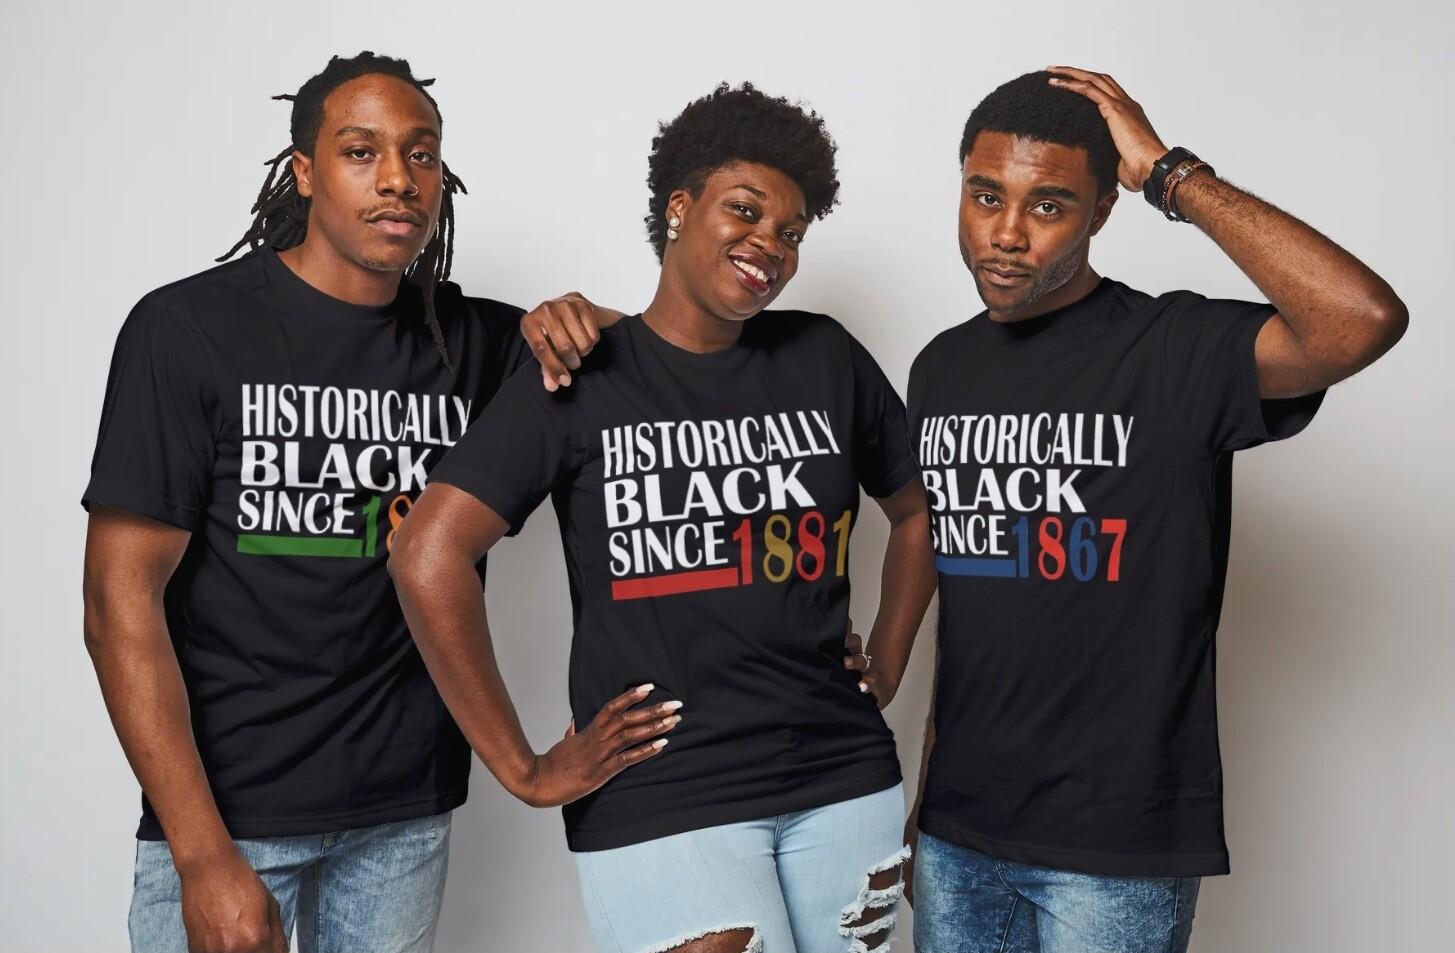 Historically Black Since Signature HBCU School Name T-Shirt